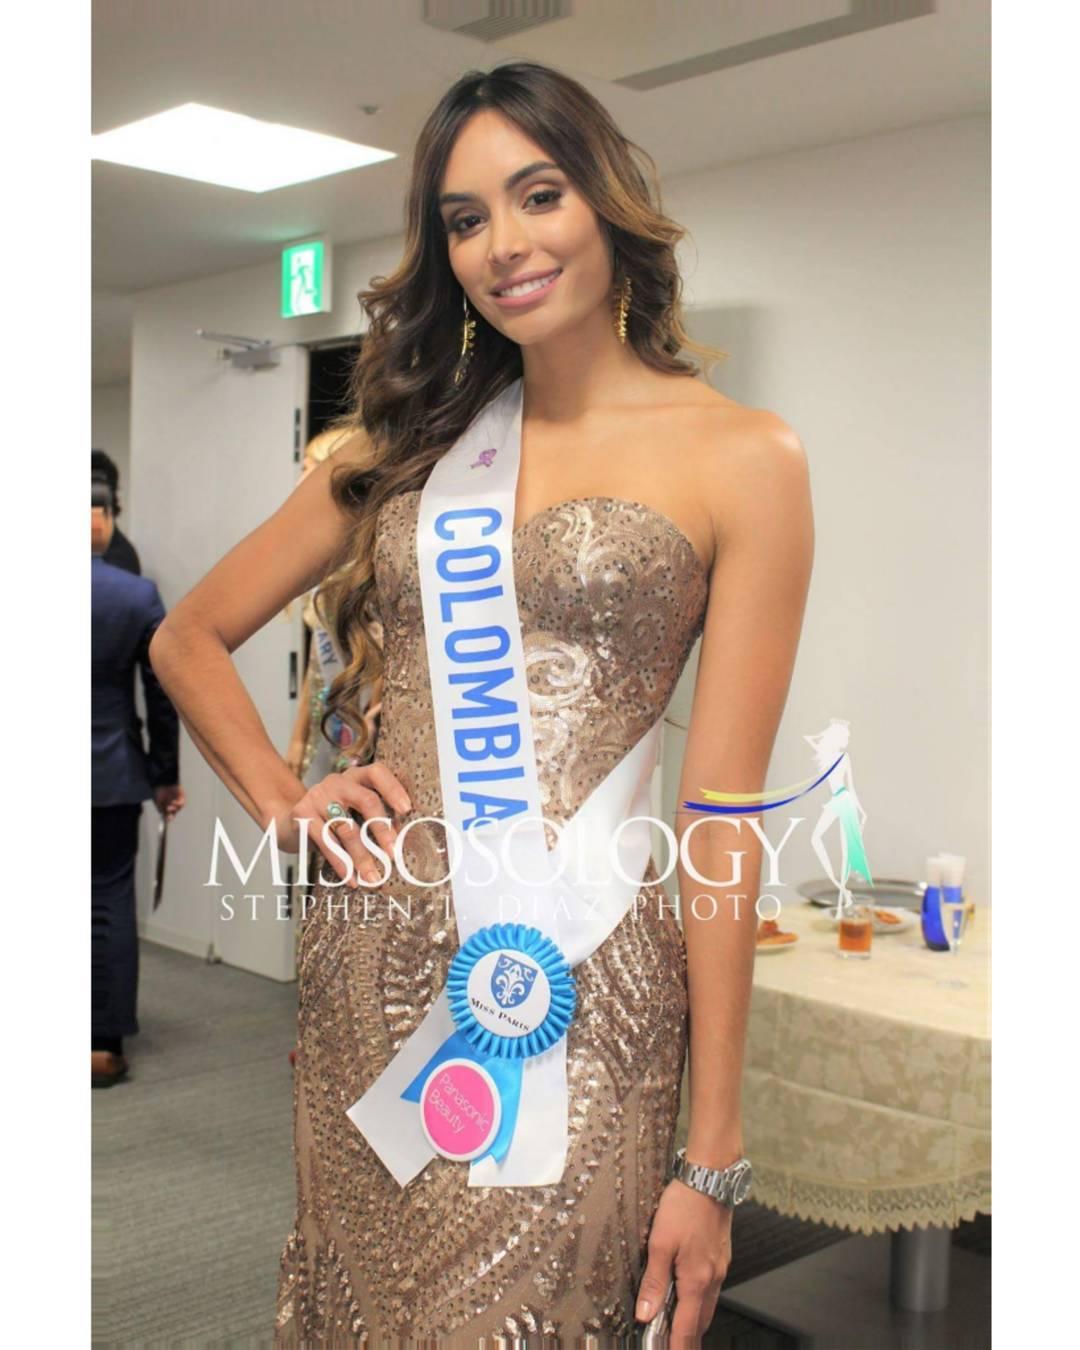 vanessa pulgarin, miss international colombia 2017. - Página 4 22794294_152881605453337_7064433539277651968_n